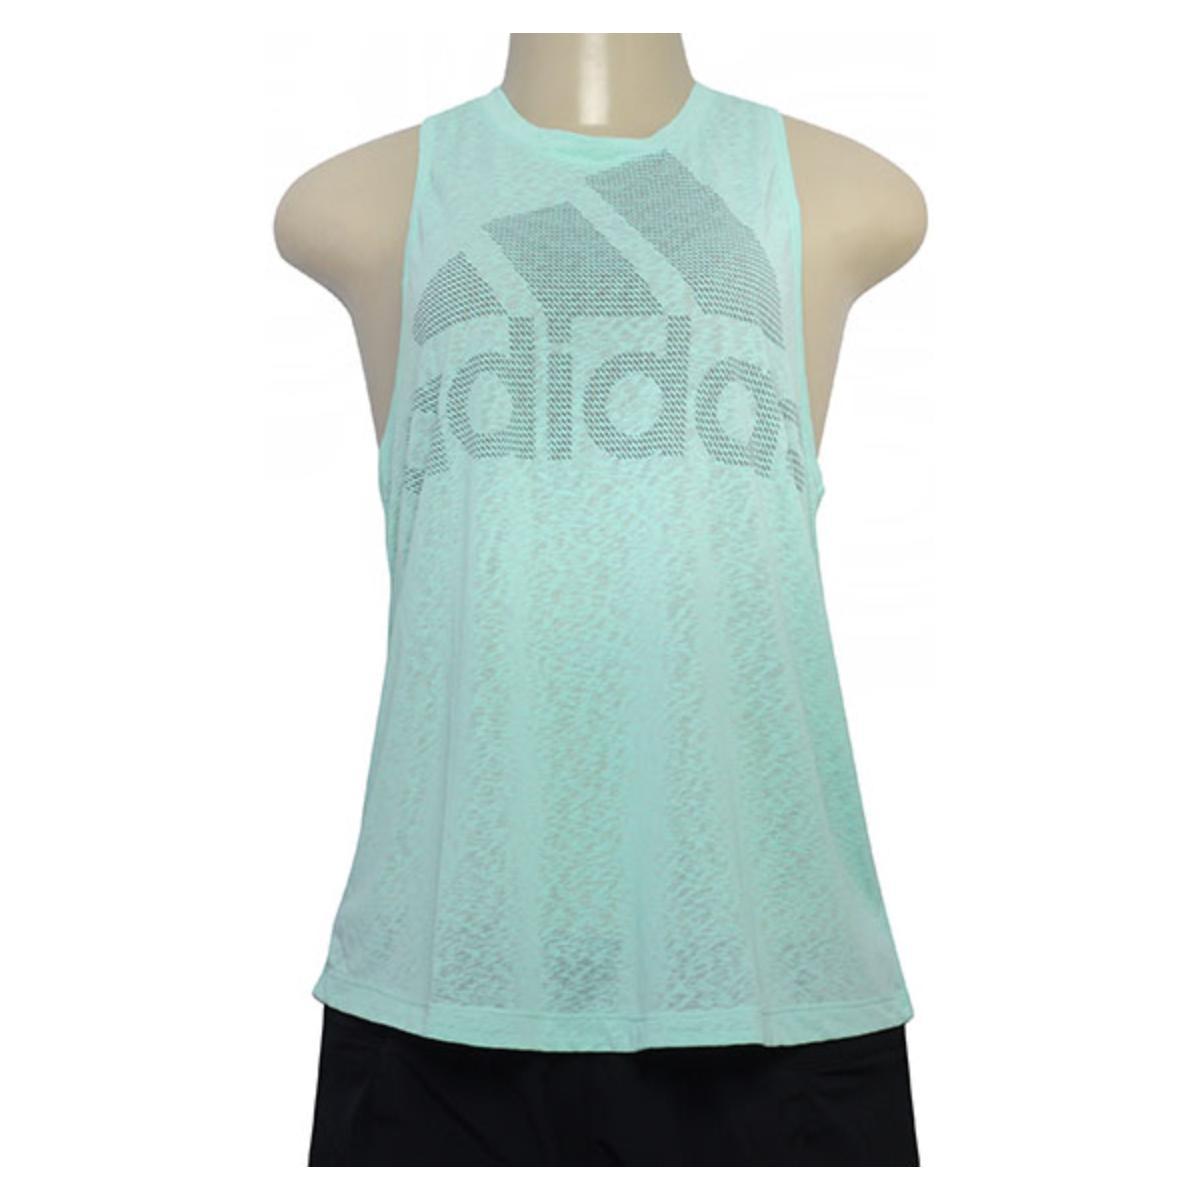 Regata Feminina Adidas Cw3854 Magic Logo Verde